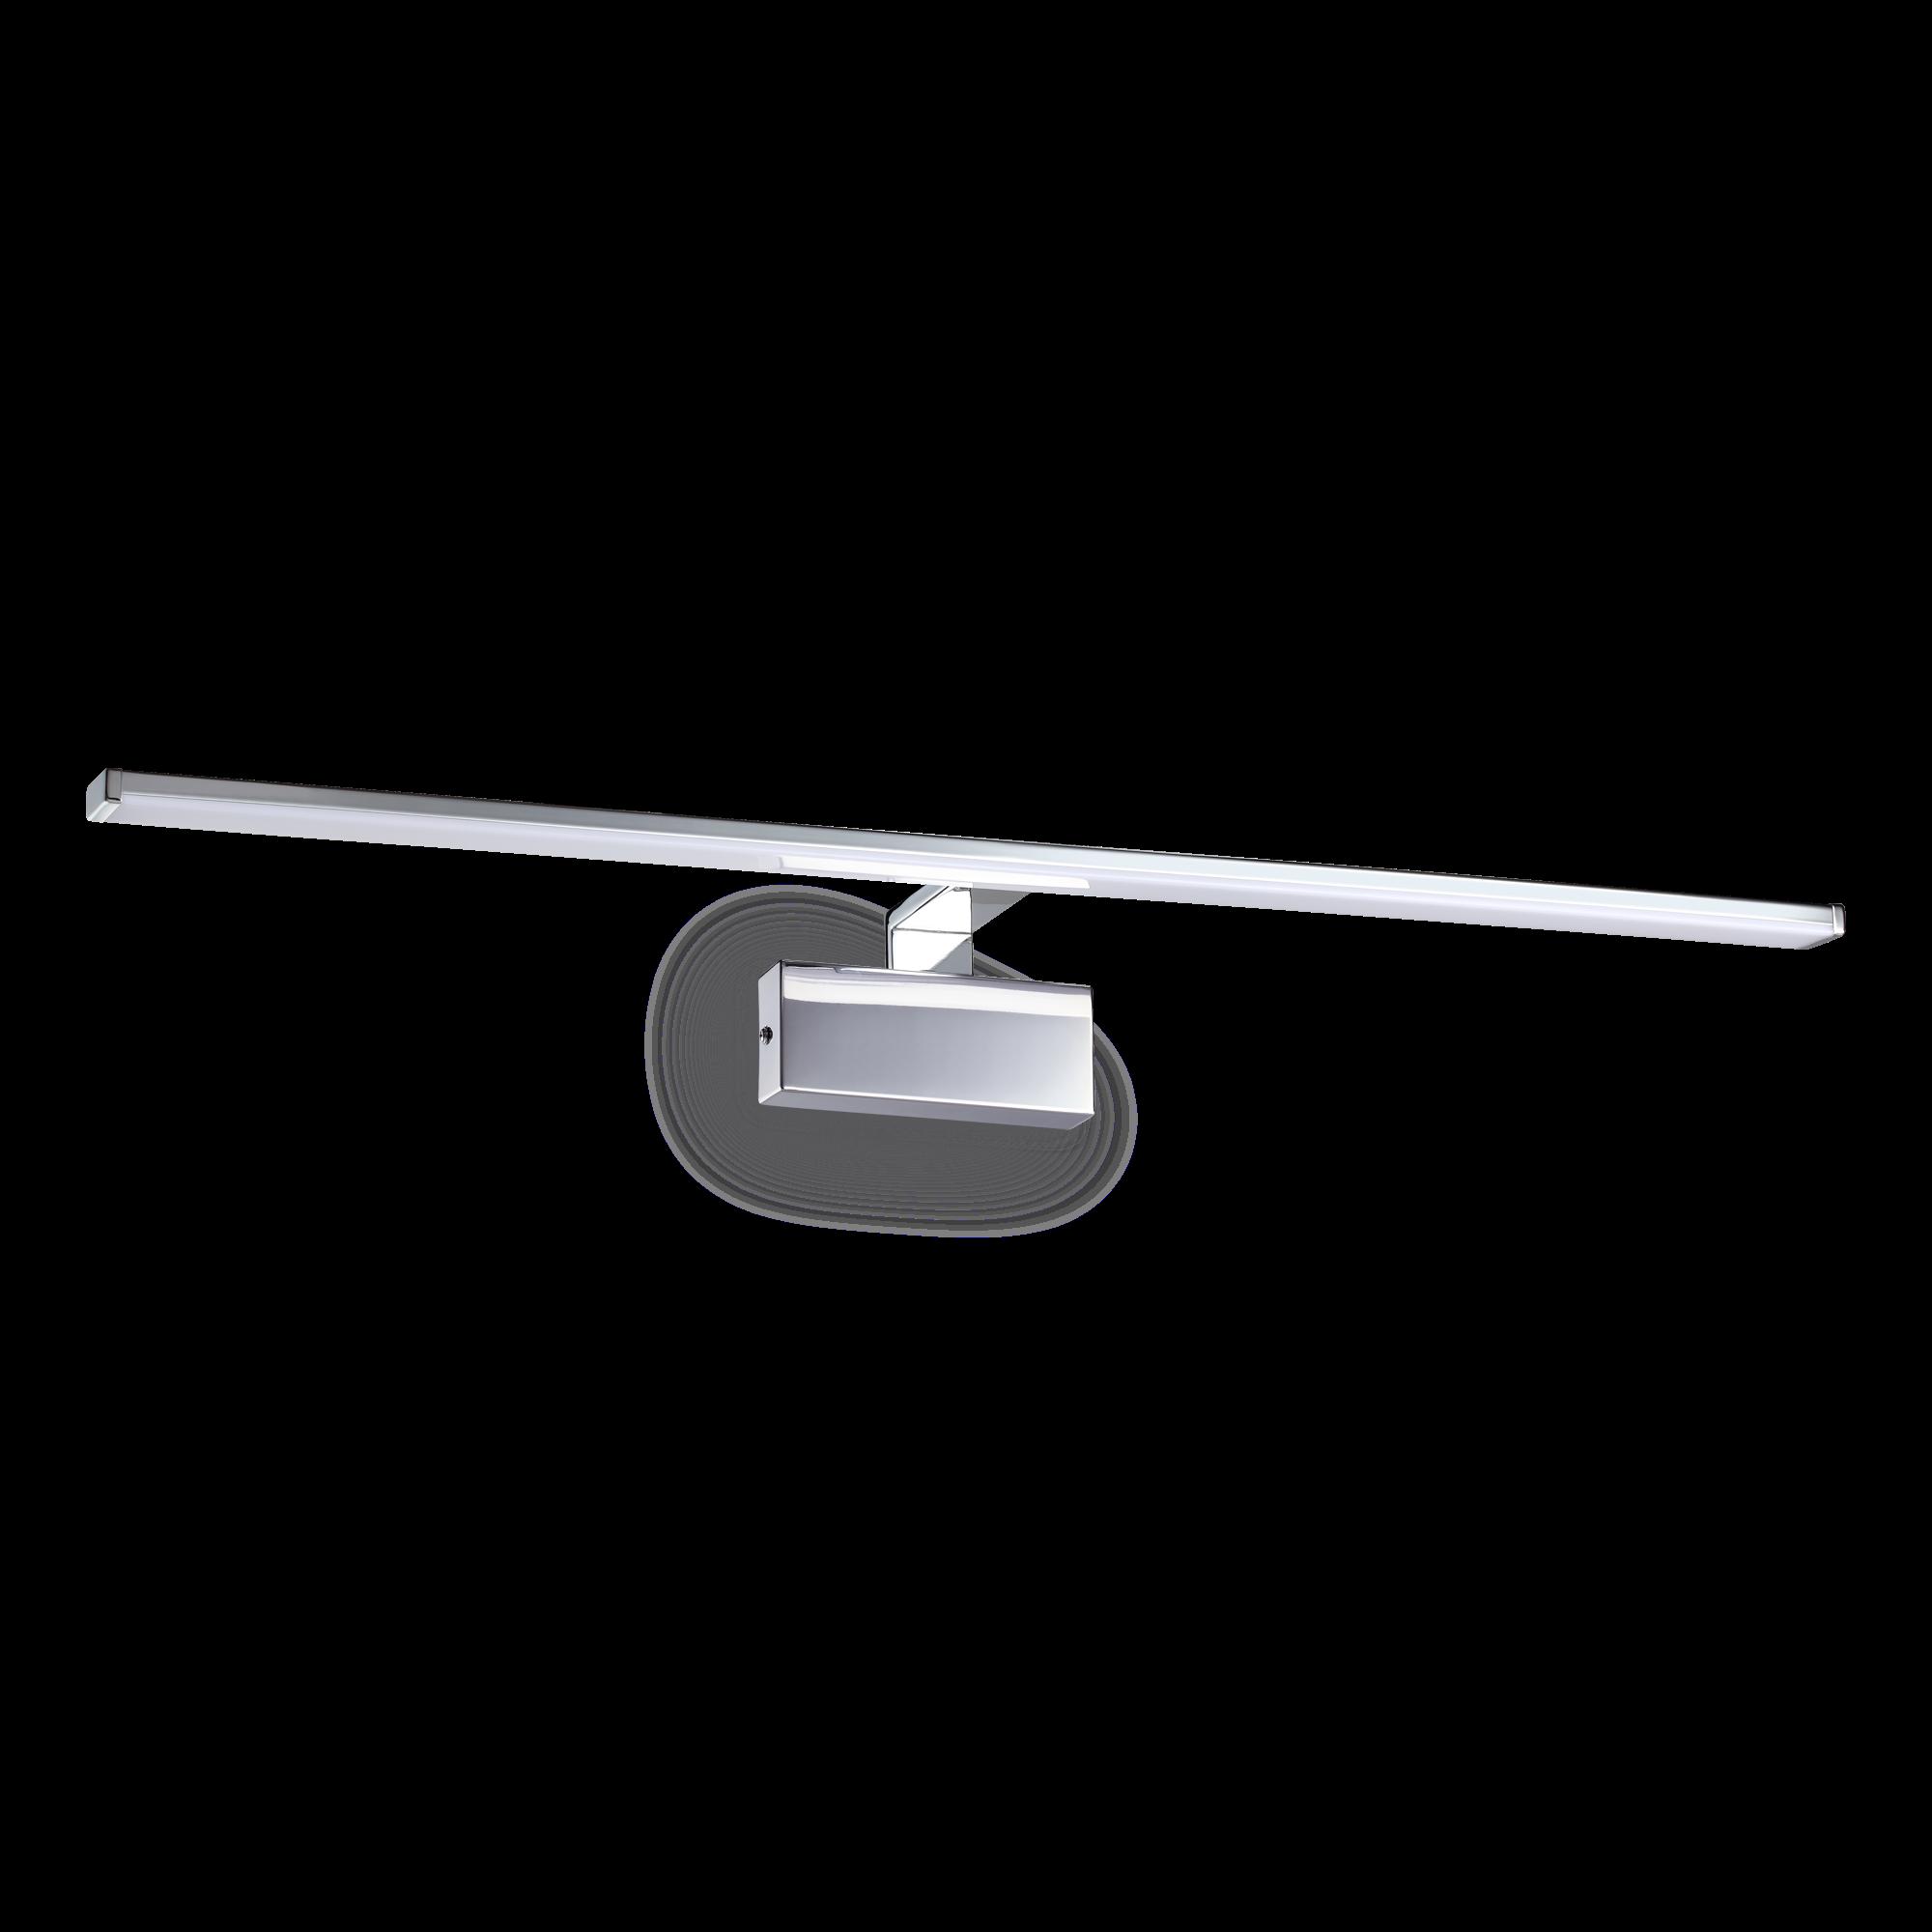 IdealLux 224992 ALMA AP nástěnné LED svítidlo k zrcadlu 20W 1300lm 3000K IP20 chrom